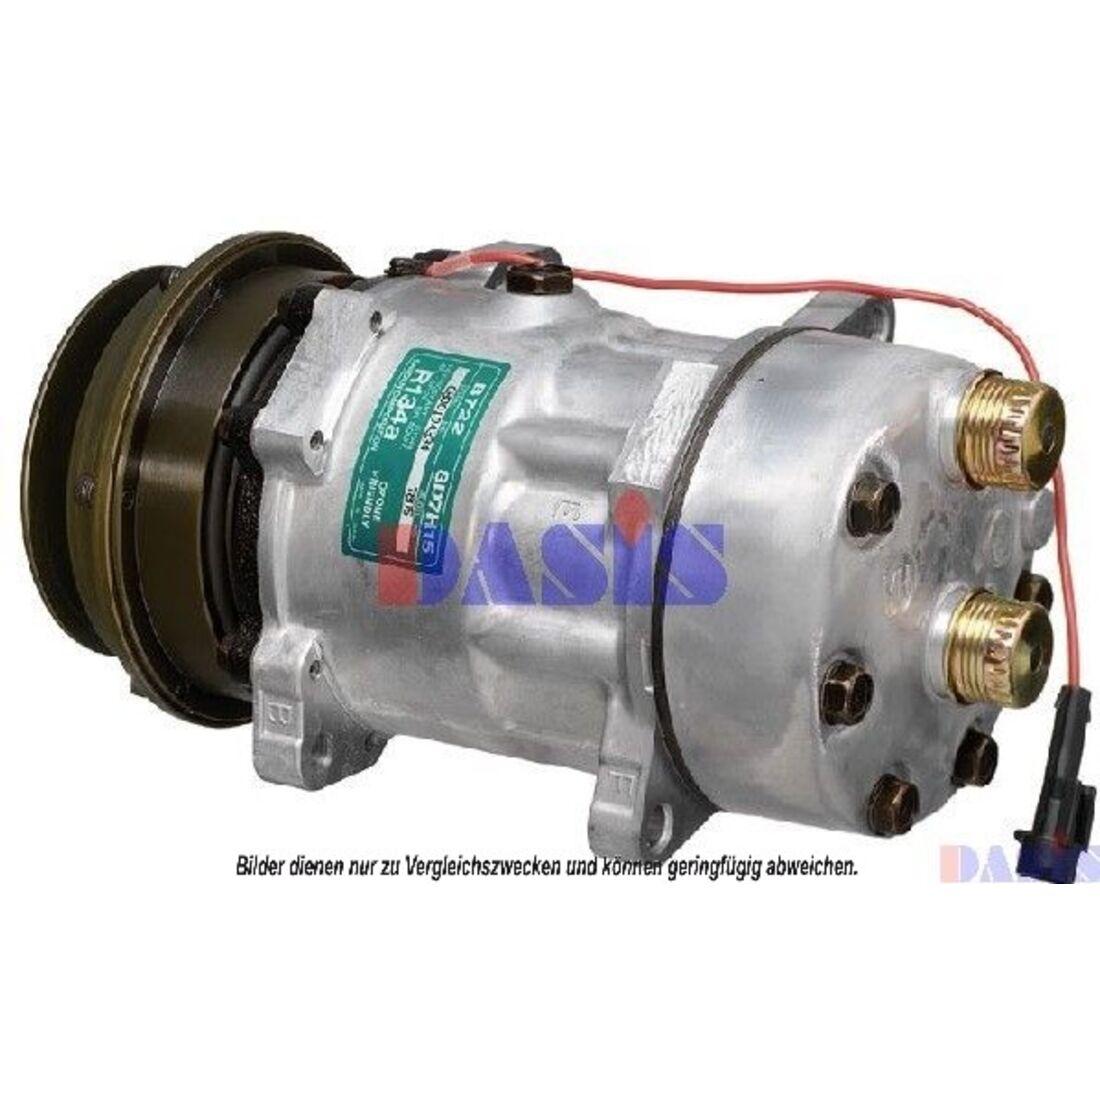 Kompressor, Klimaanlage -- AKS DASIS, FIAT, LANCIA, DUCATO Kasten...